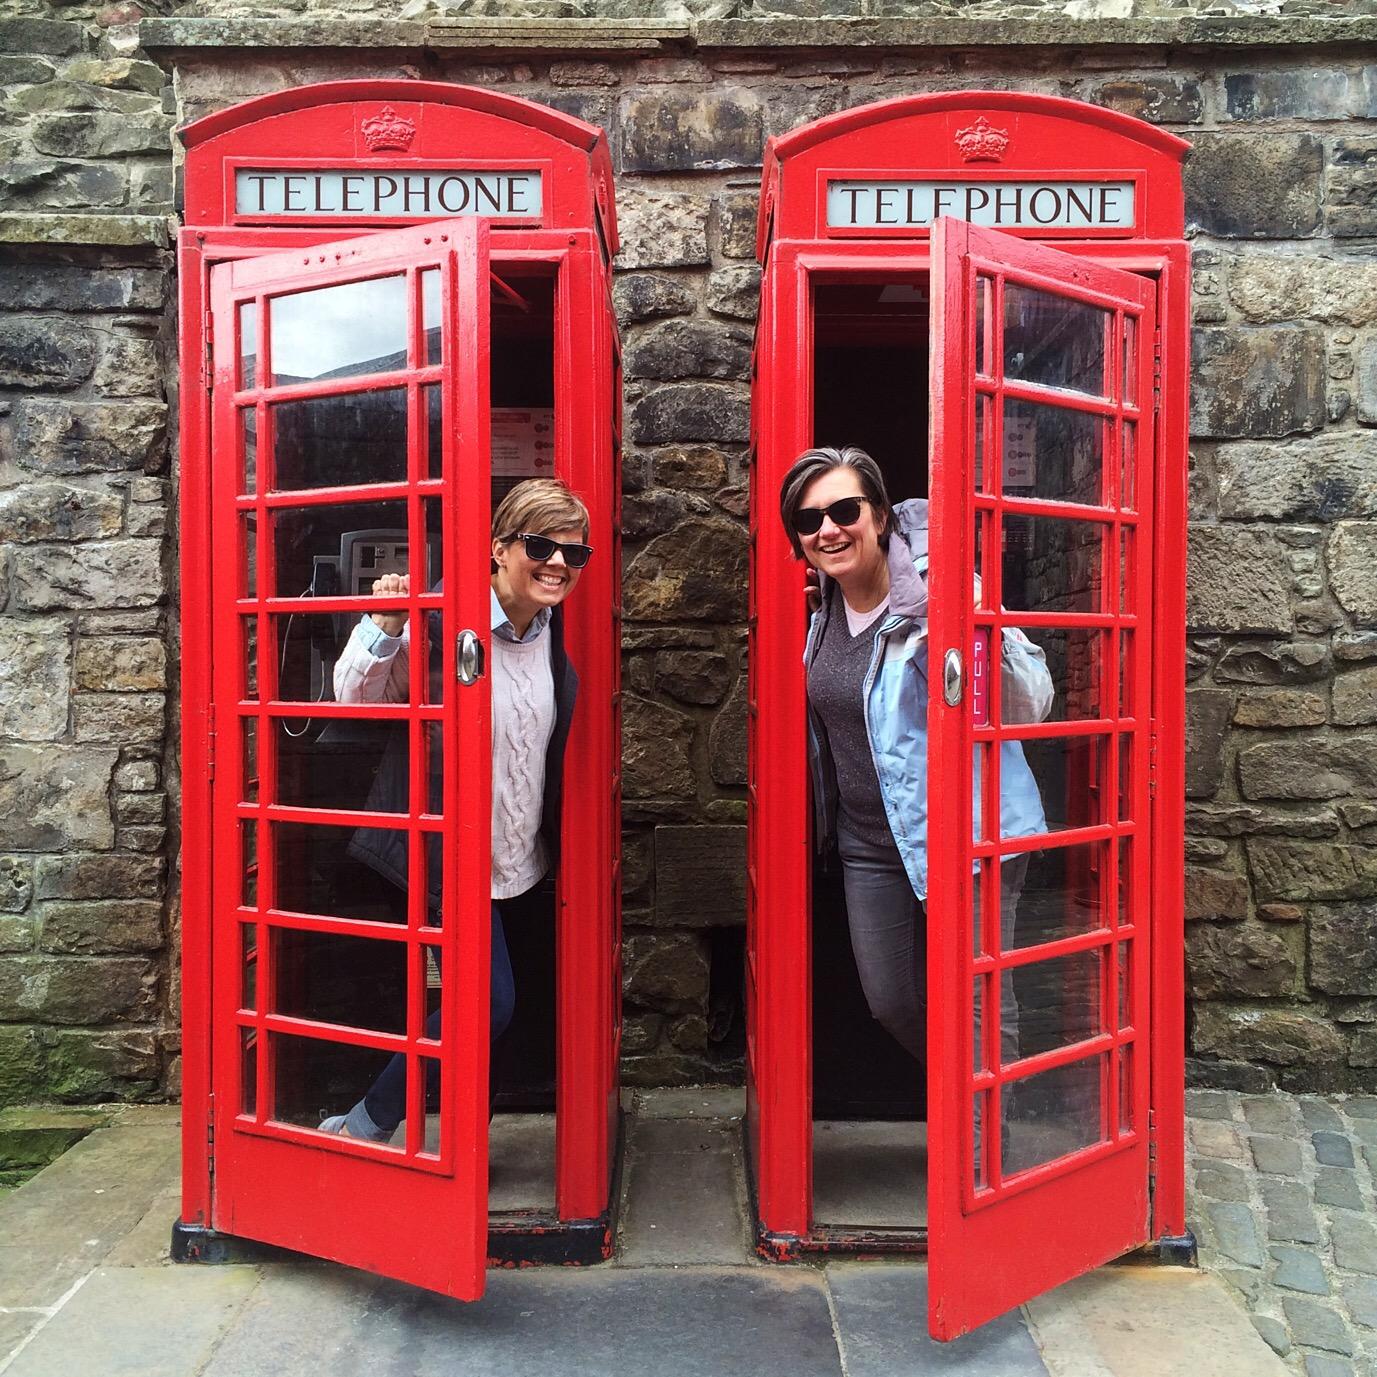 Visiting Edinburgh, Red Phone Booths, UK, Scotland